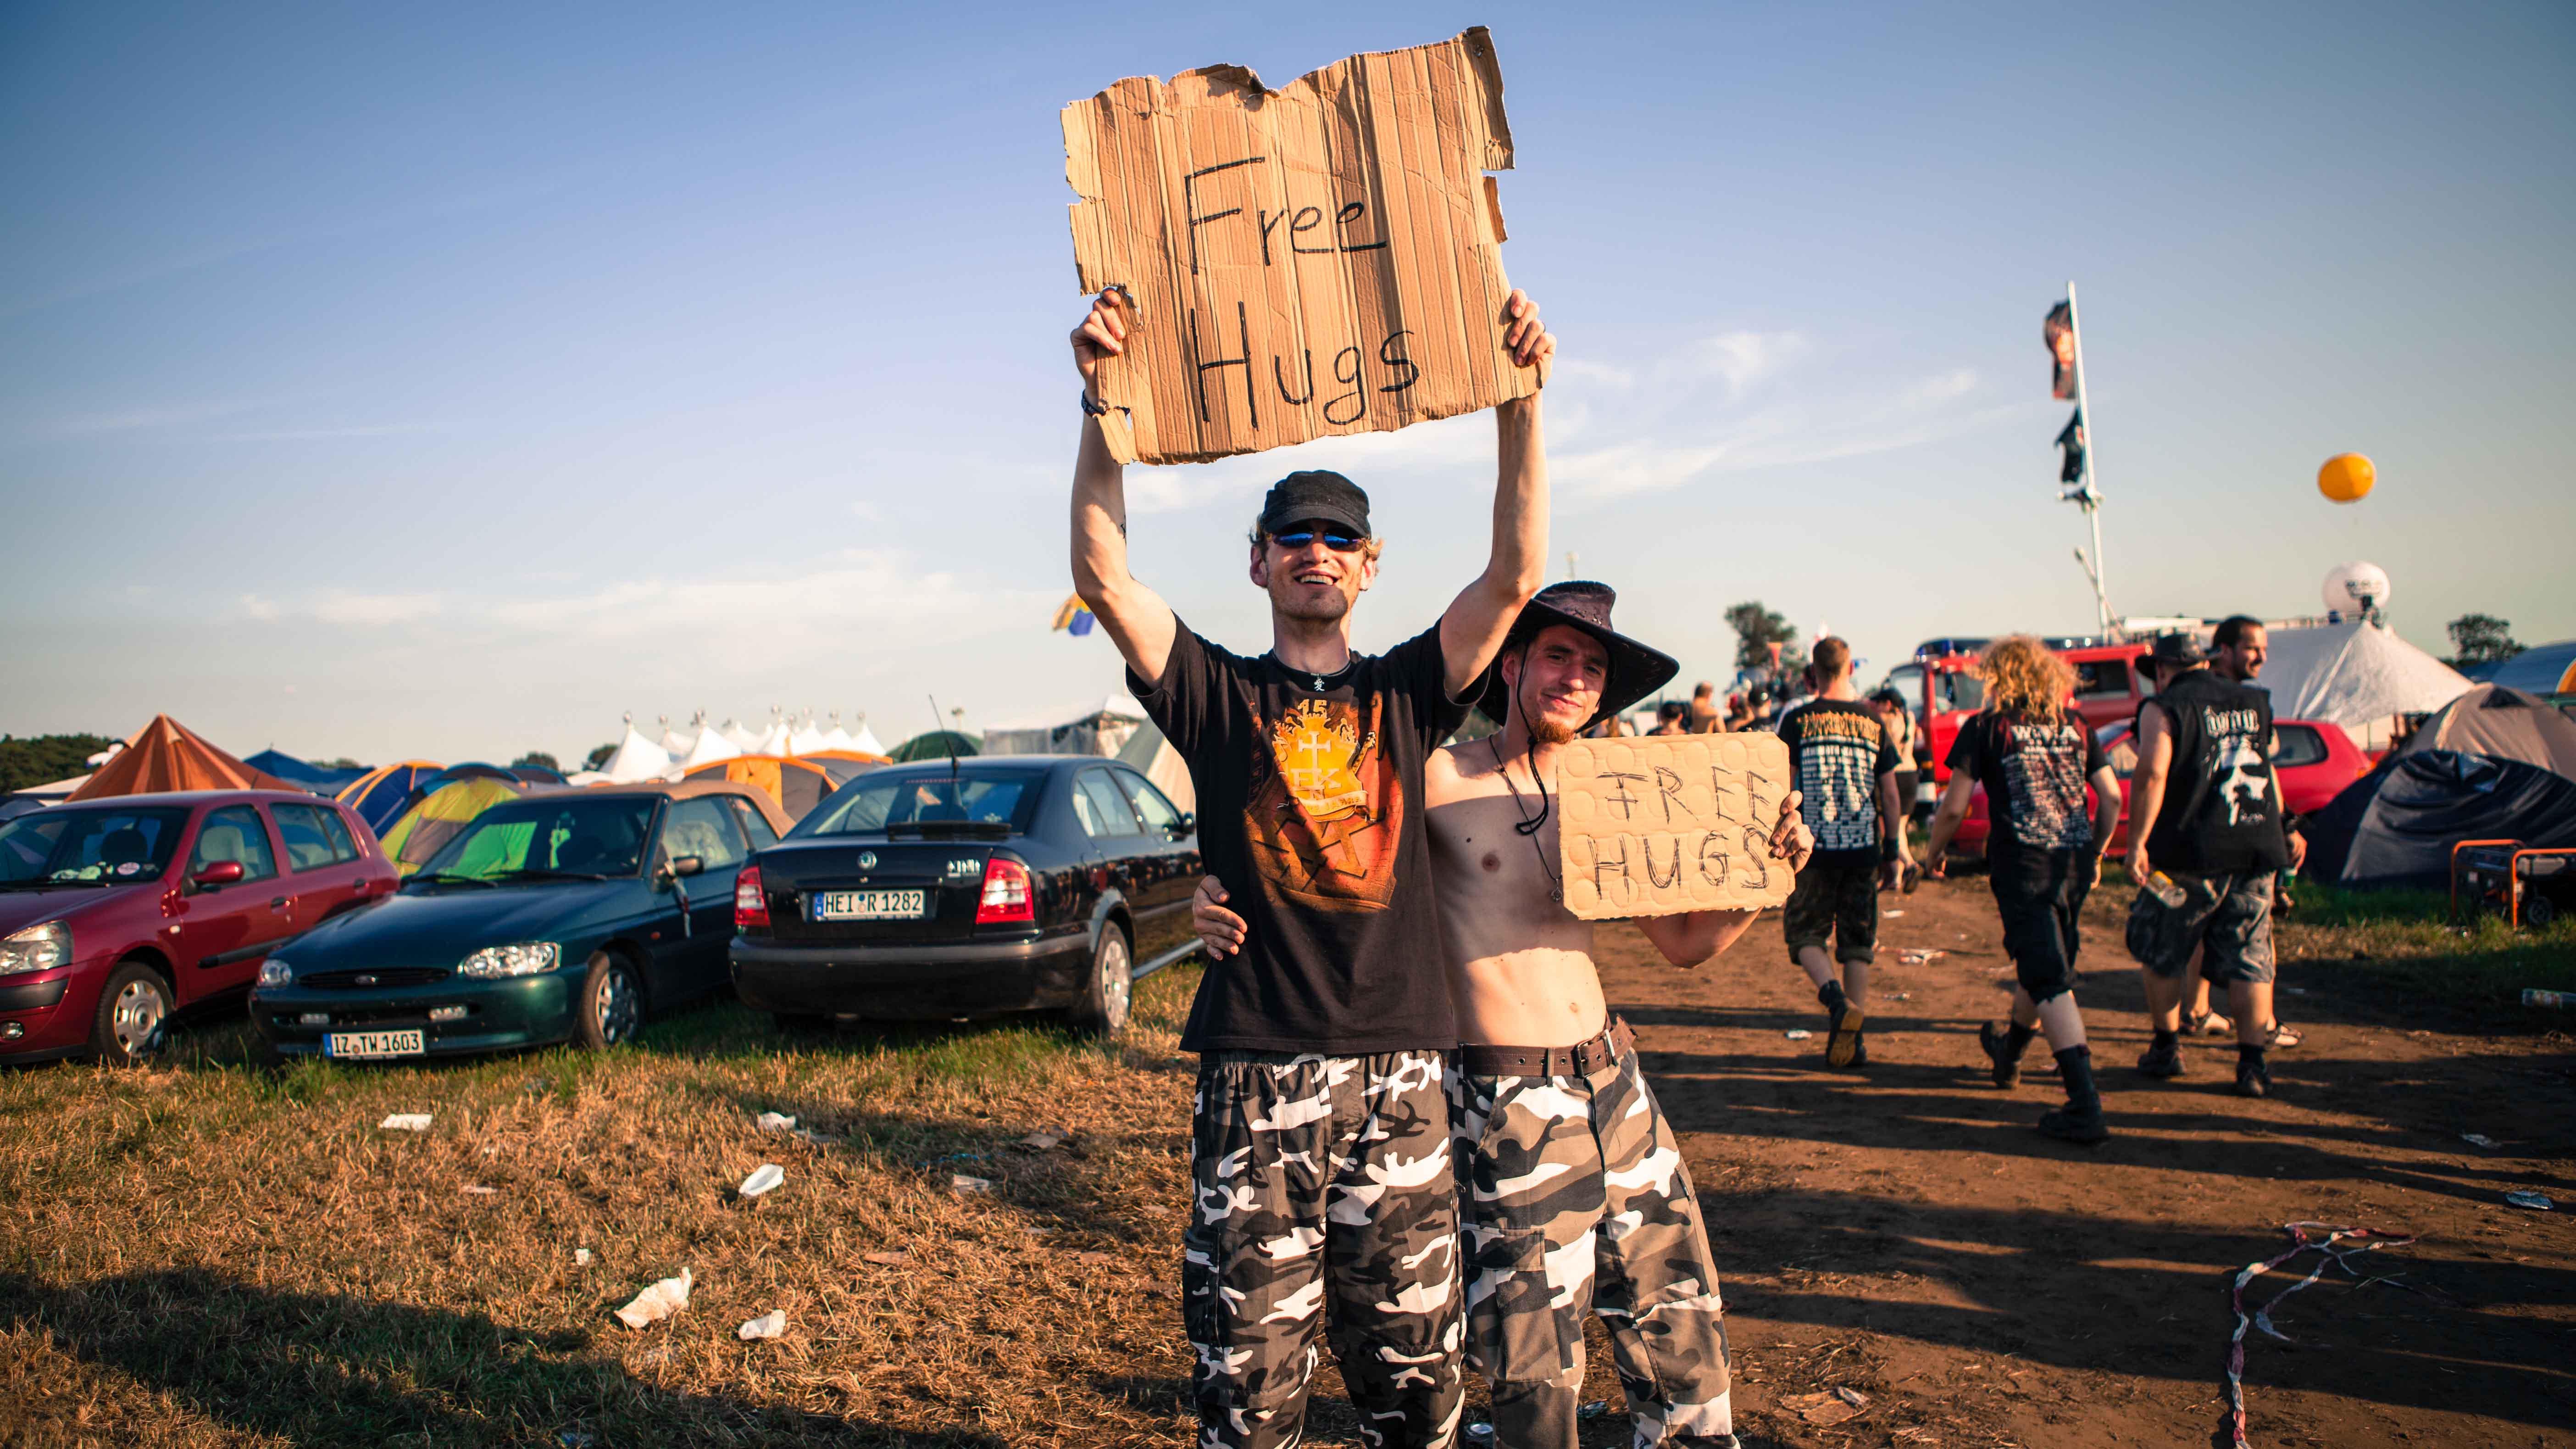 Free Hugs auf dem WOA